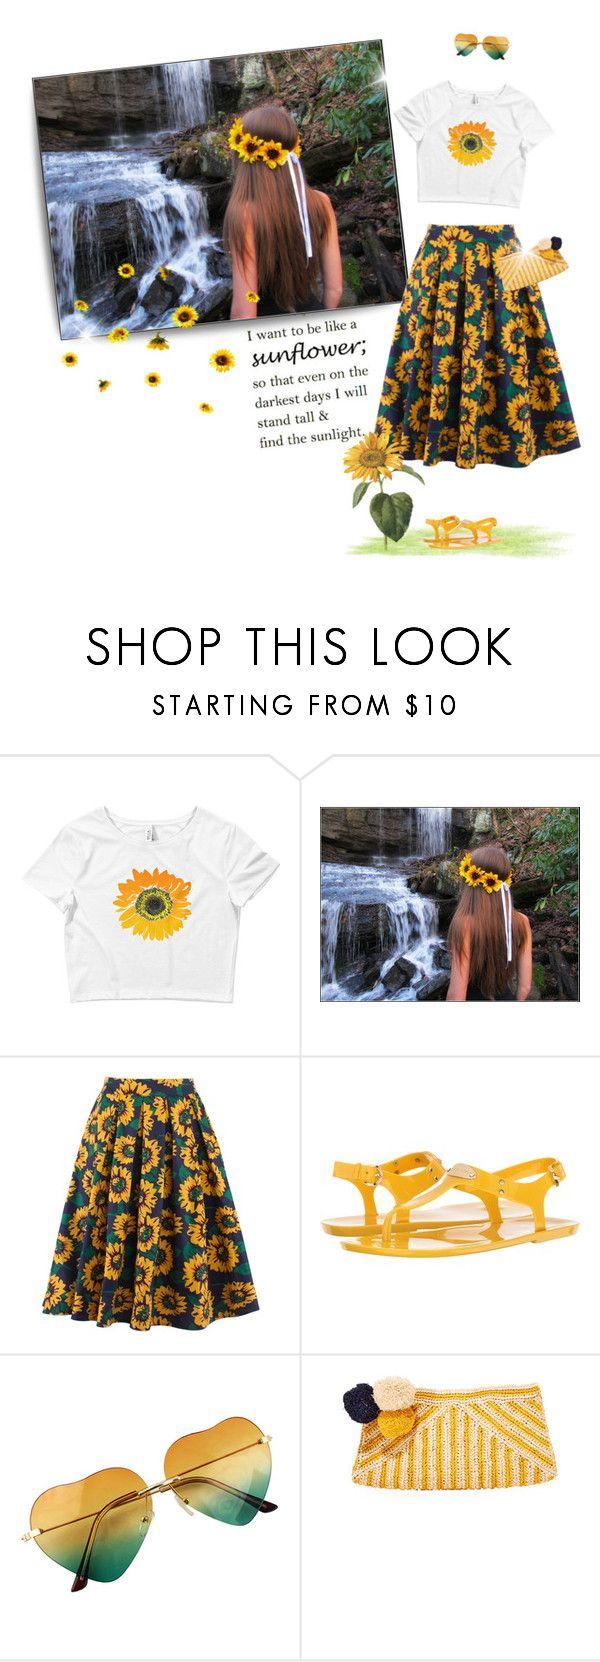 Sunflower Poem | Sunflower poem, Summer dresses, Fashion